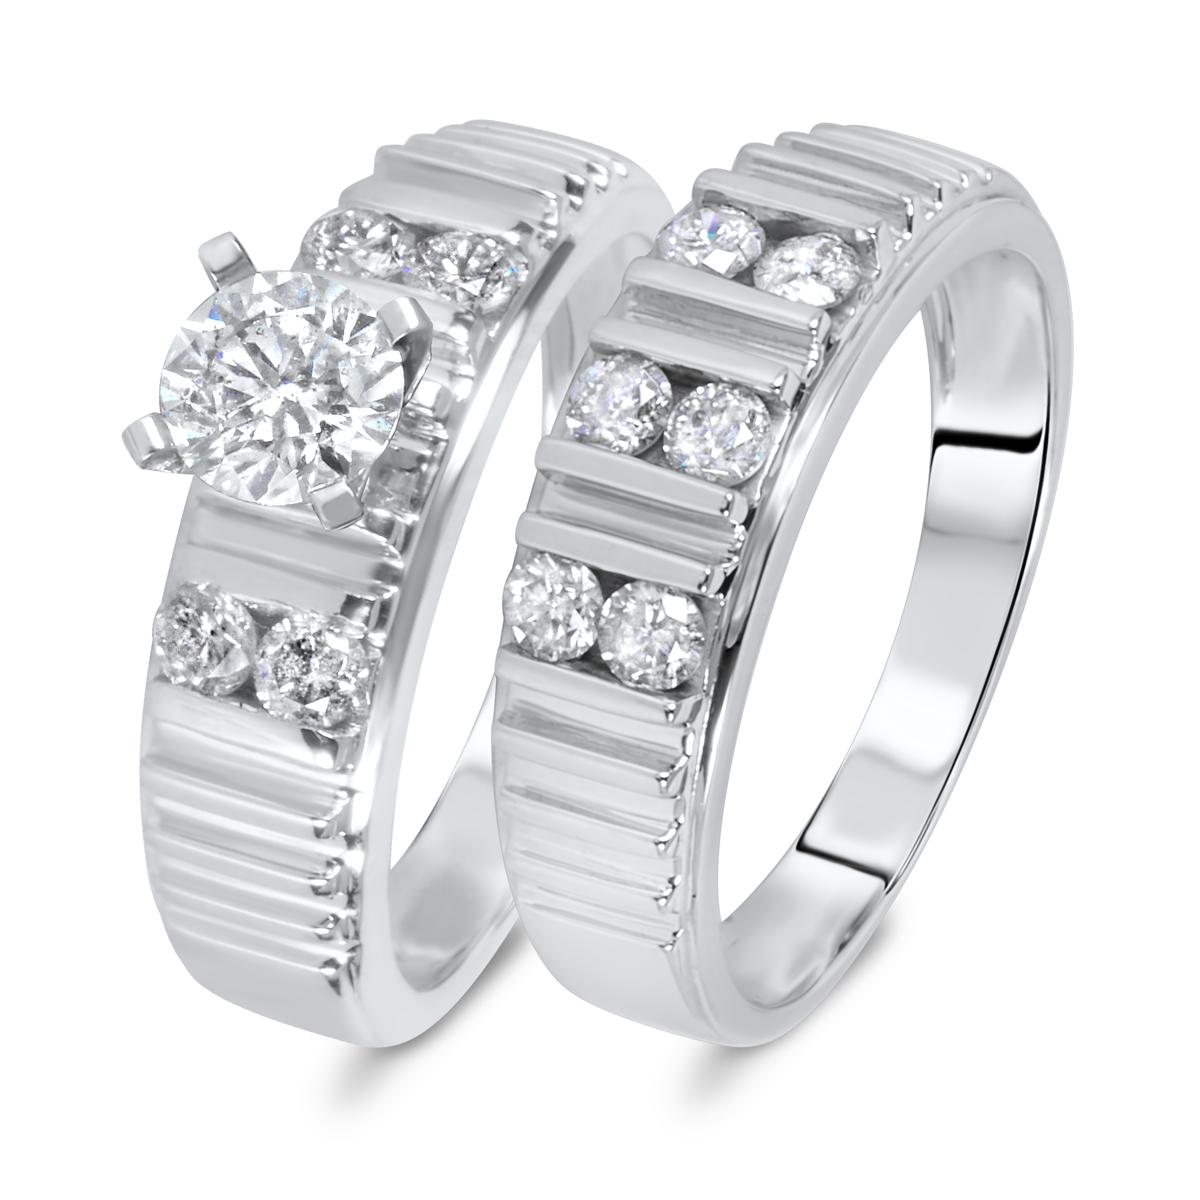 1 1/8 CT. T.W. Diamond Women's Bridal Wedding Ring Set 14K White Gold